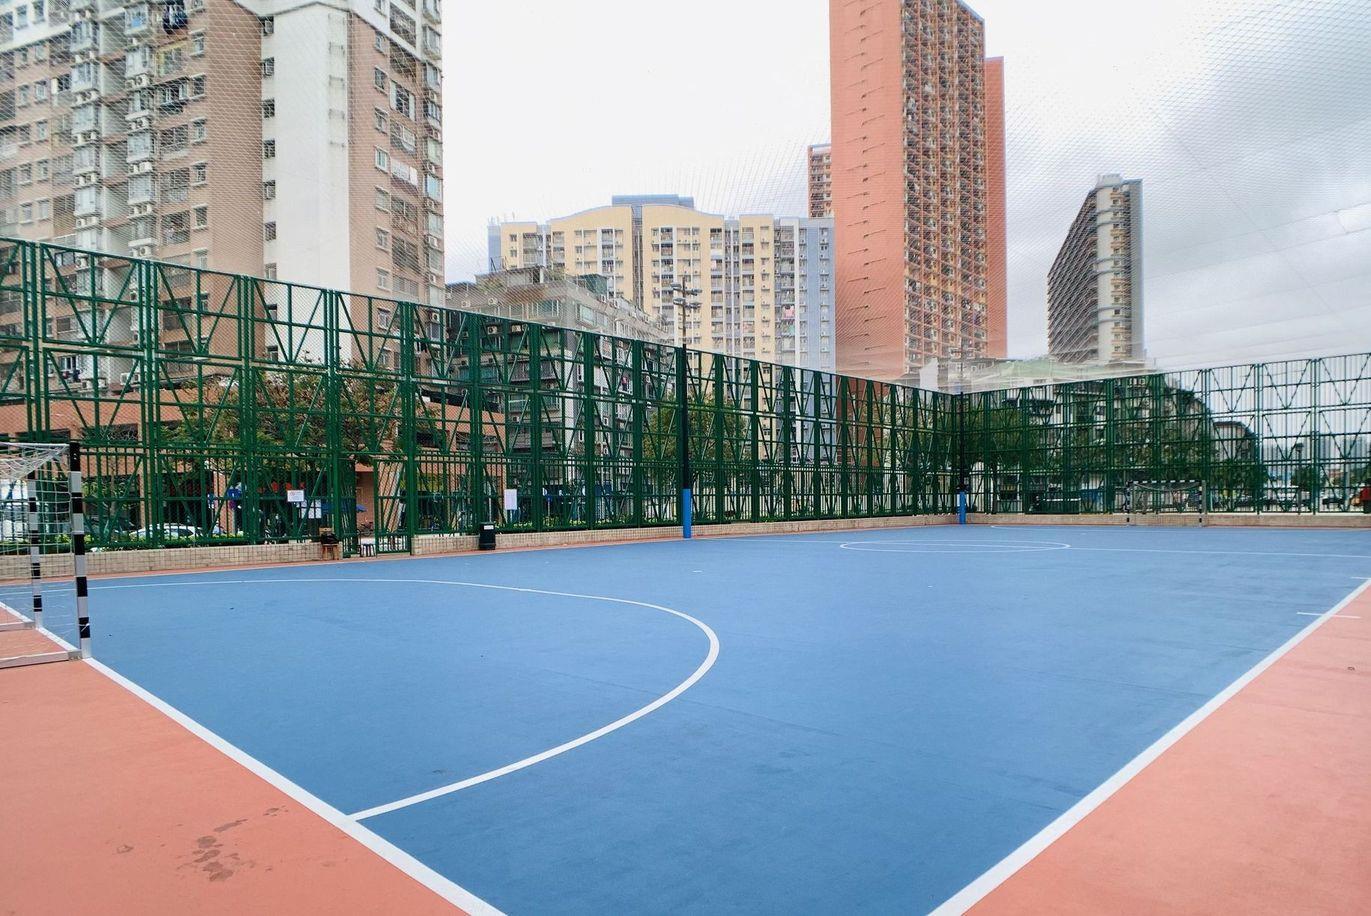 Free Sports Ground in Estrada do Canal dos Patos